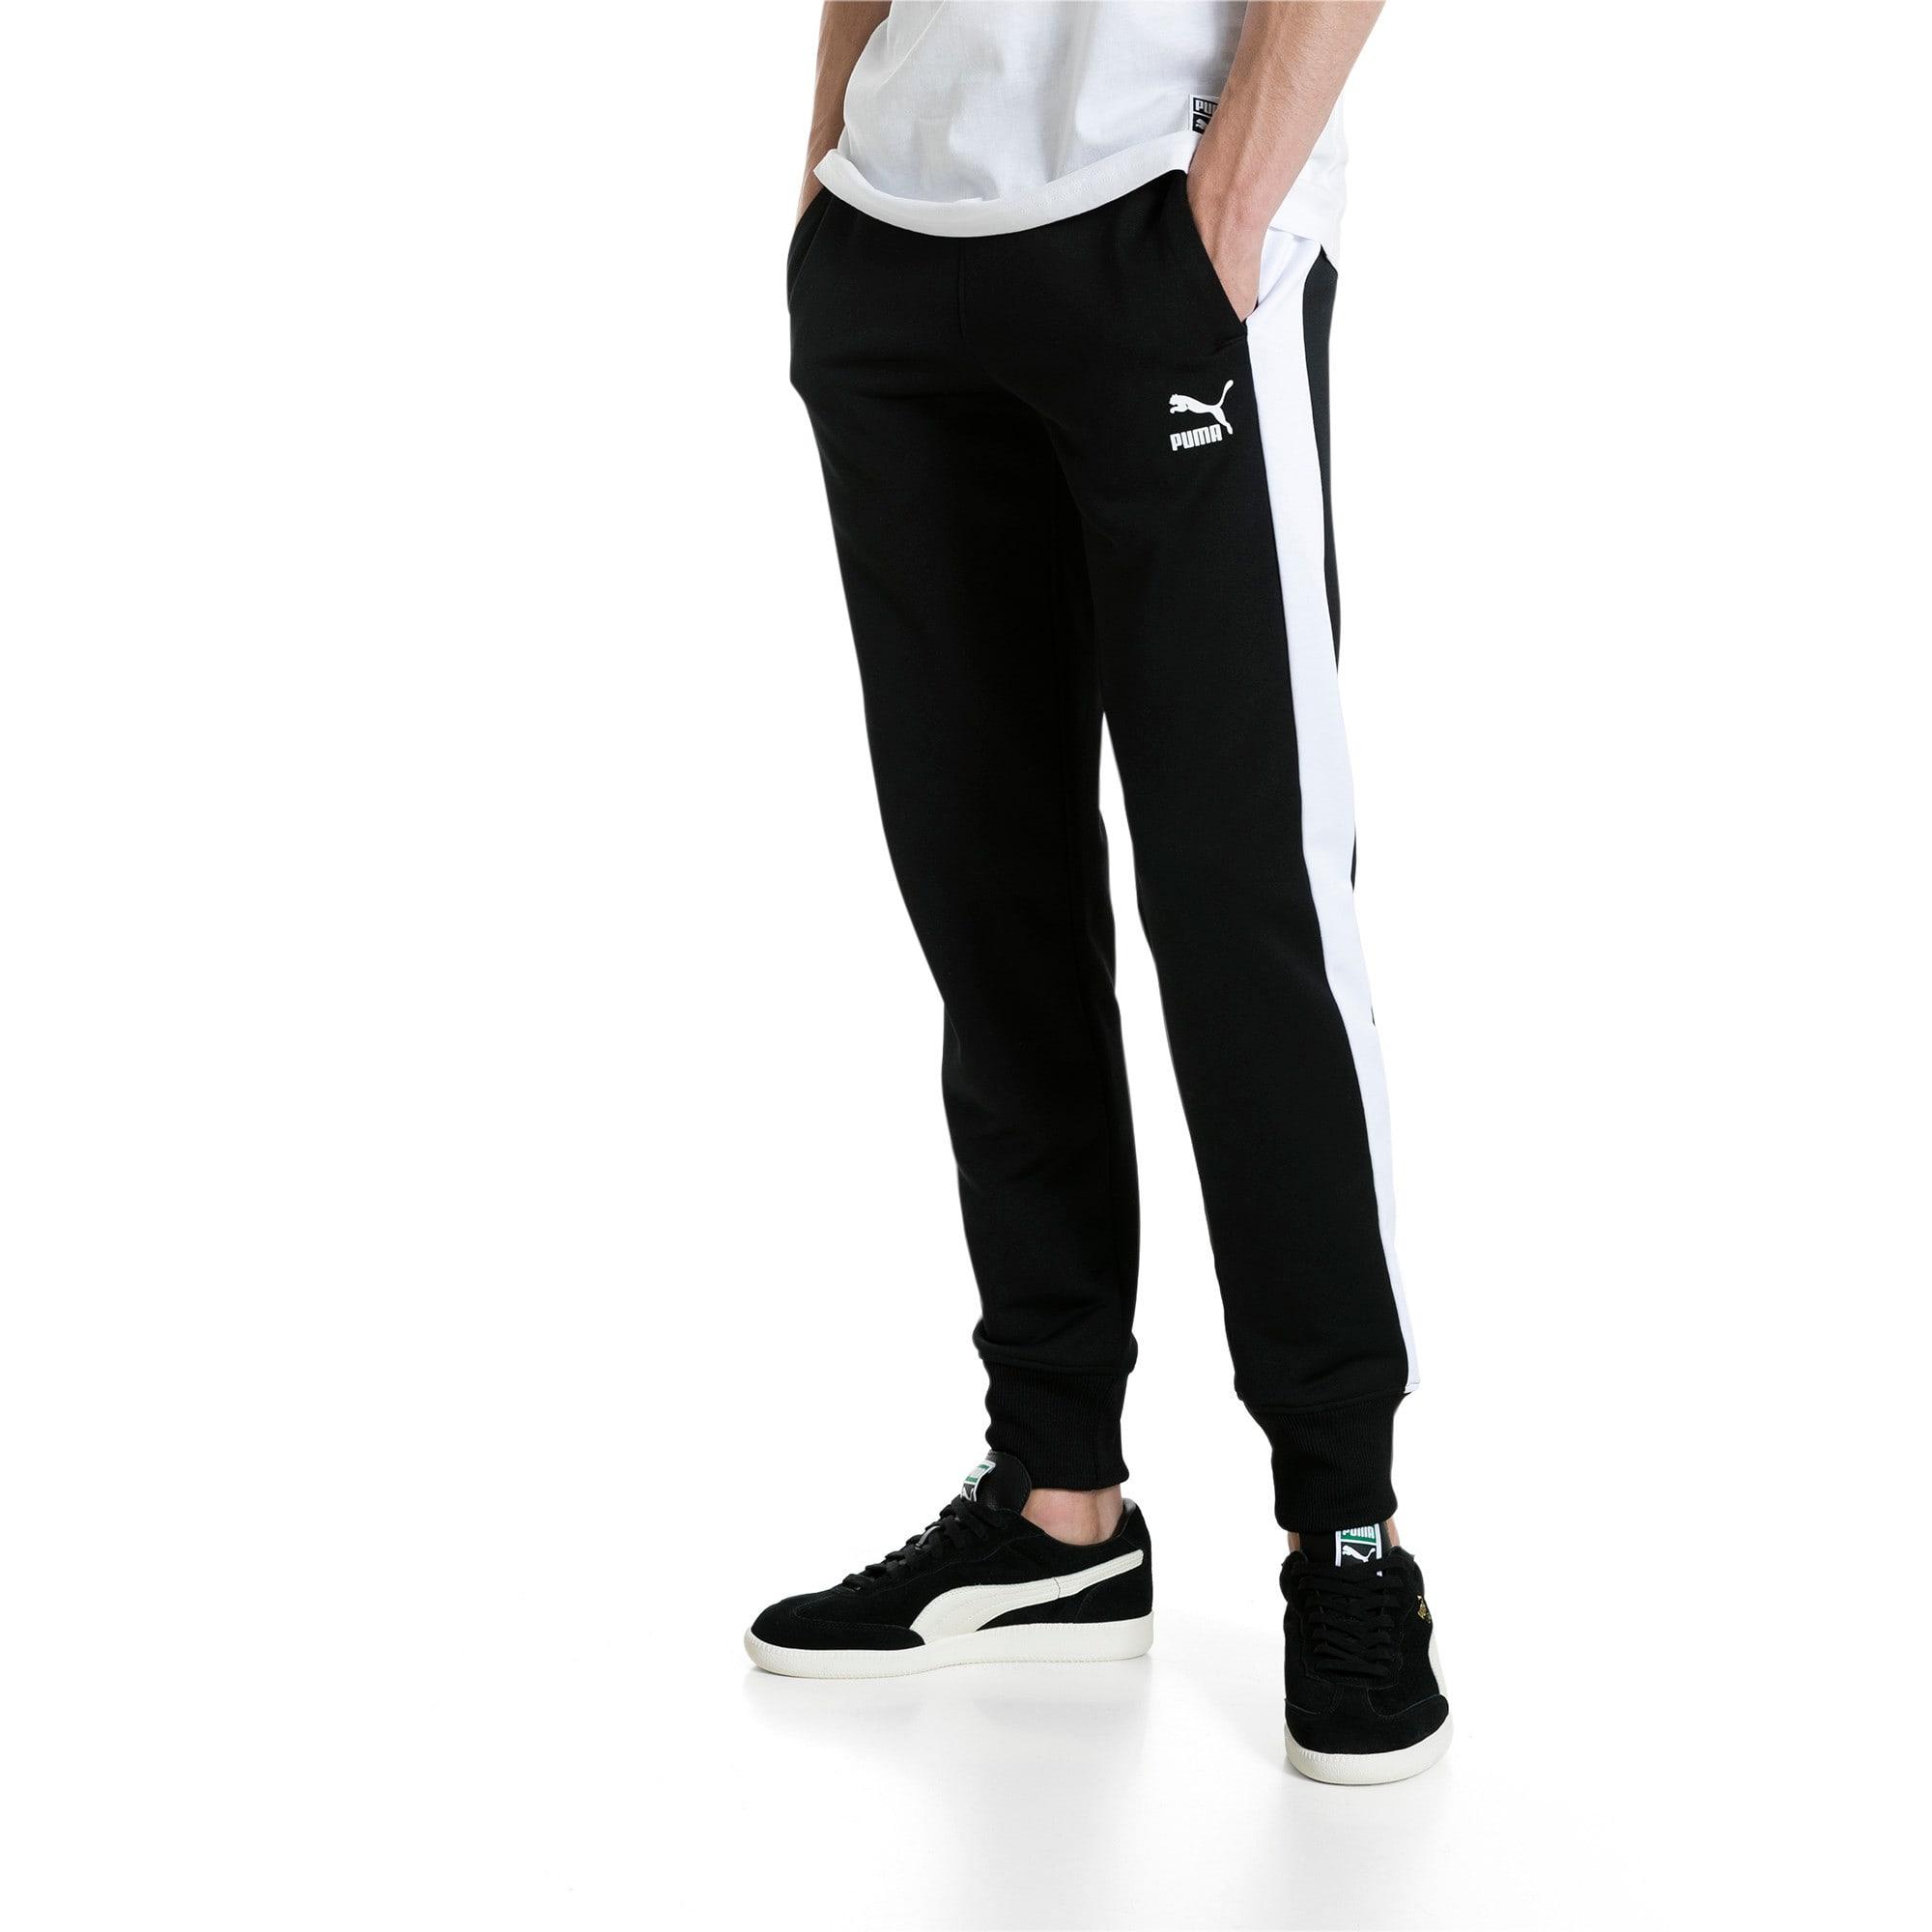 Thumbnail 1 of Archive Men's T7 Track Pants, Puma Black, medium-IND